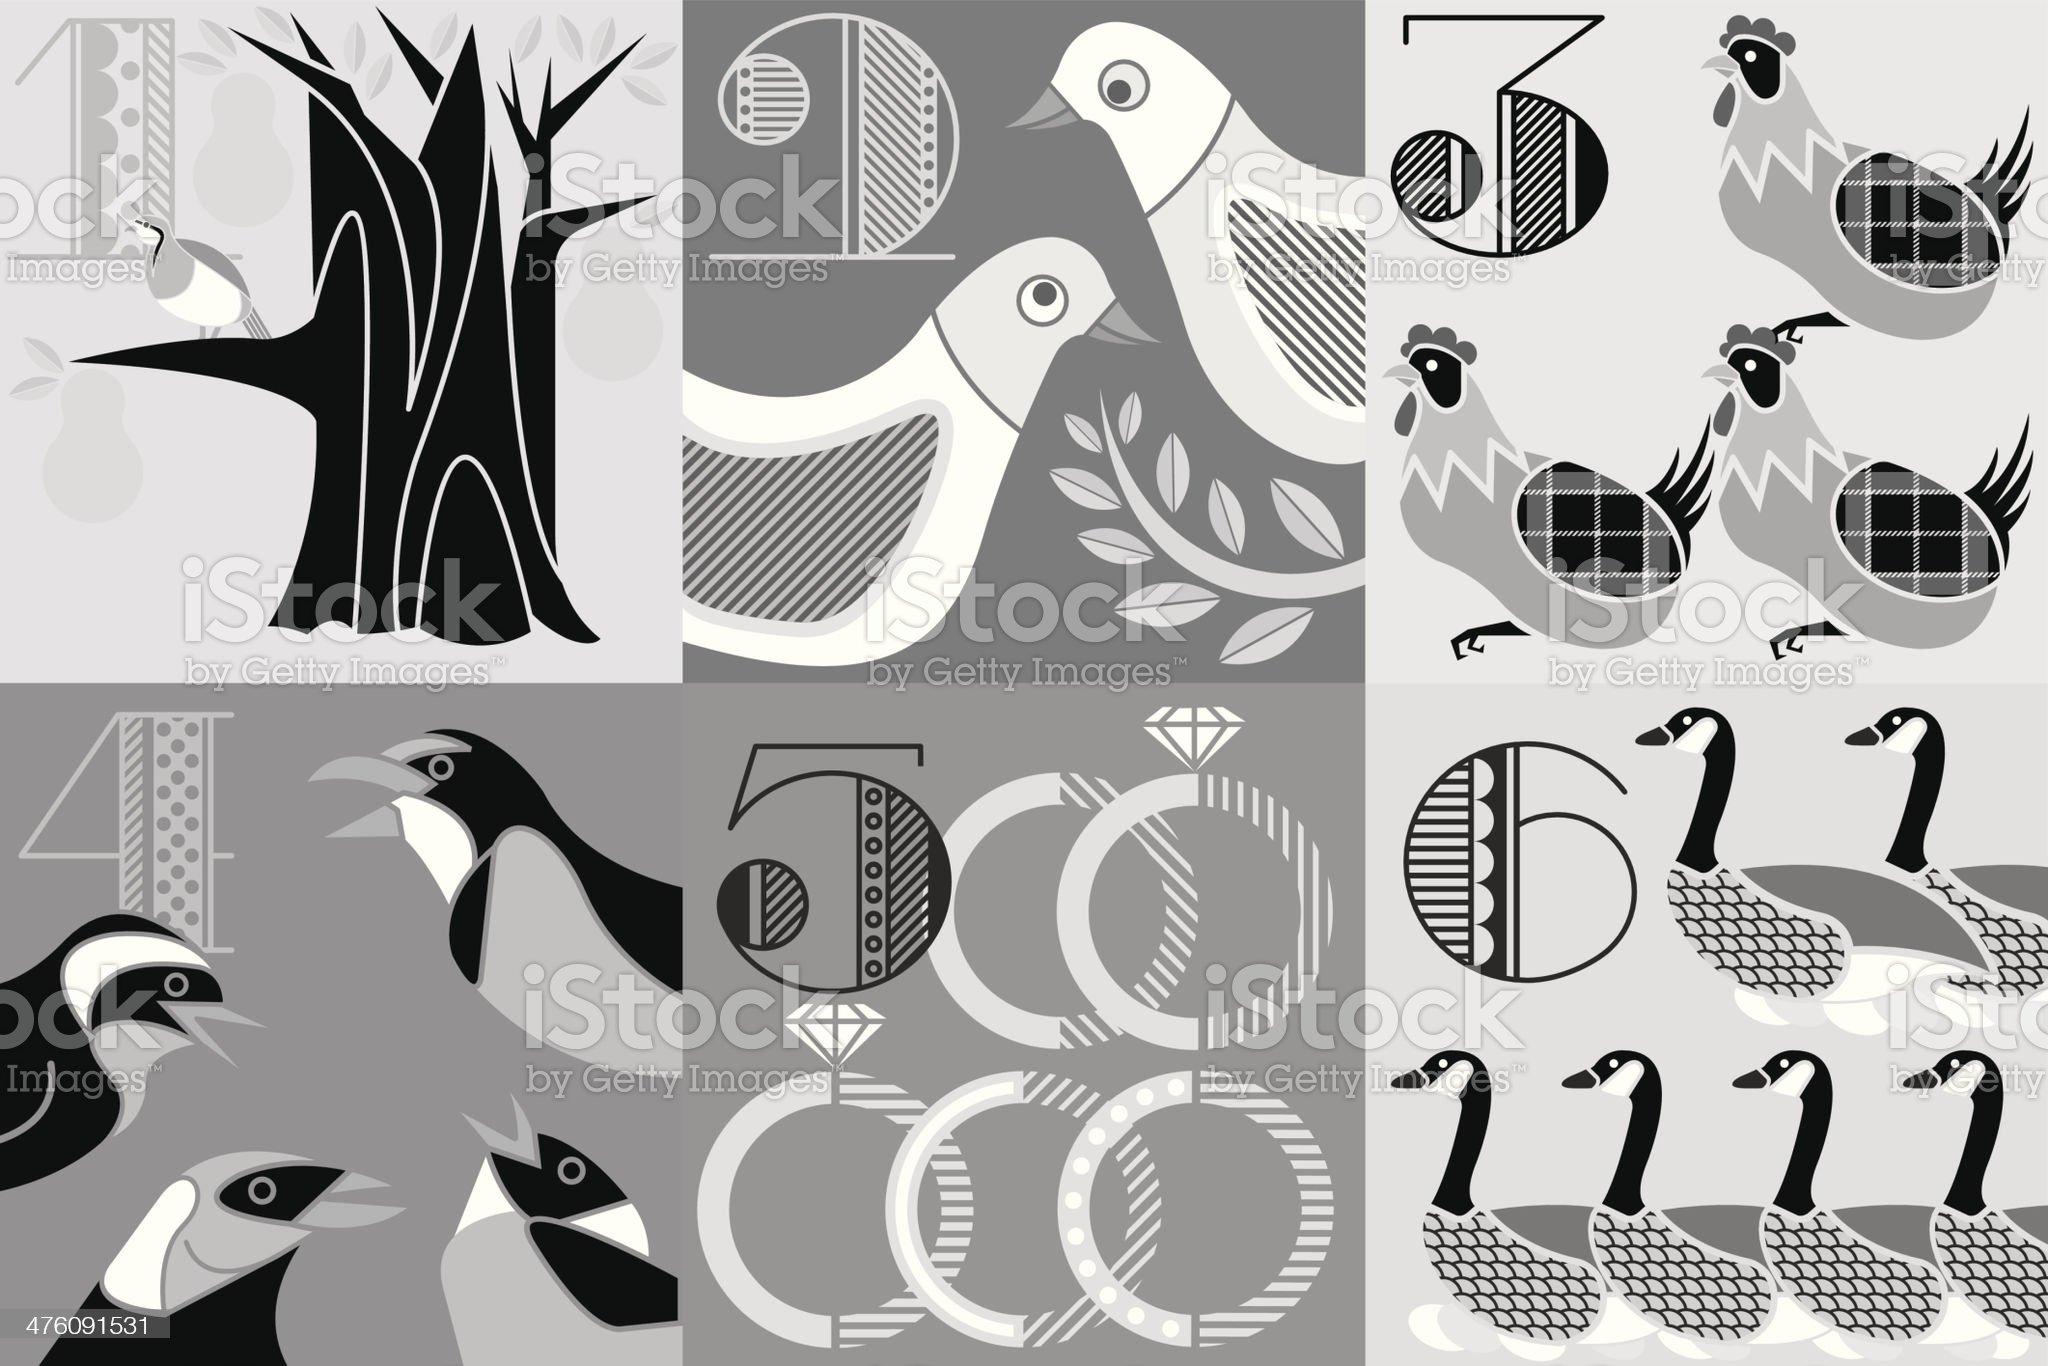 Twelve Days Christmas royalty-free stock vector art